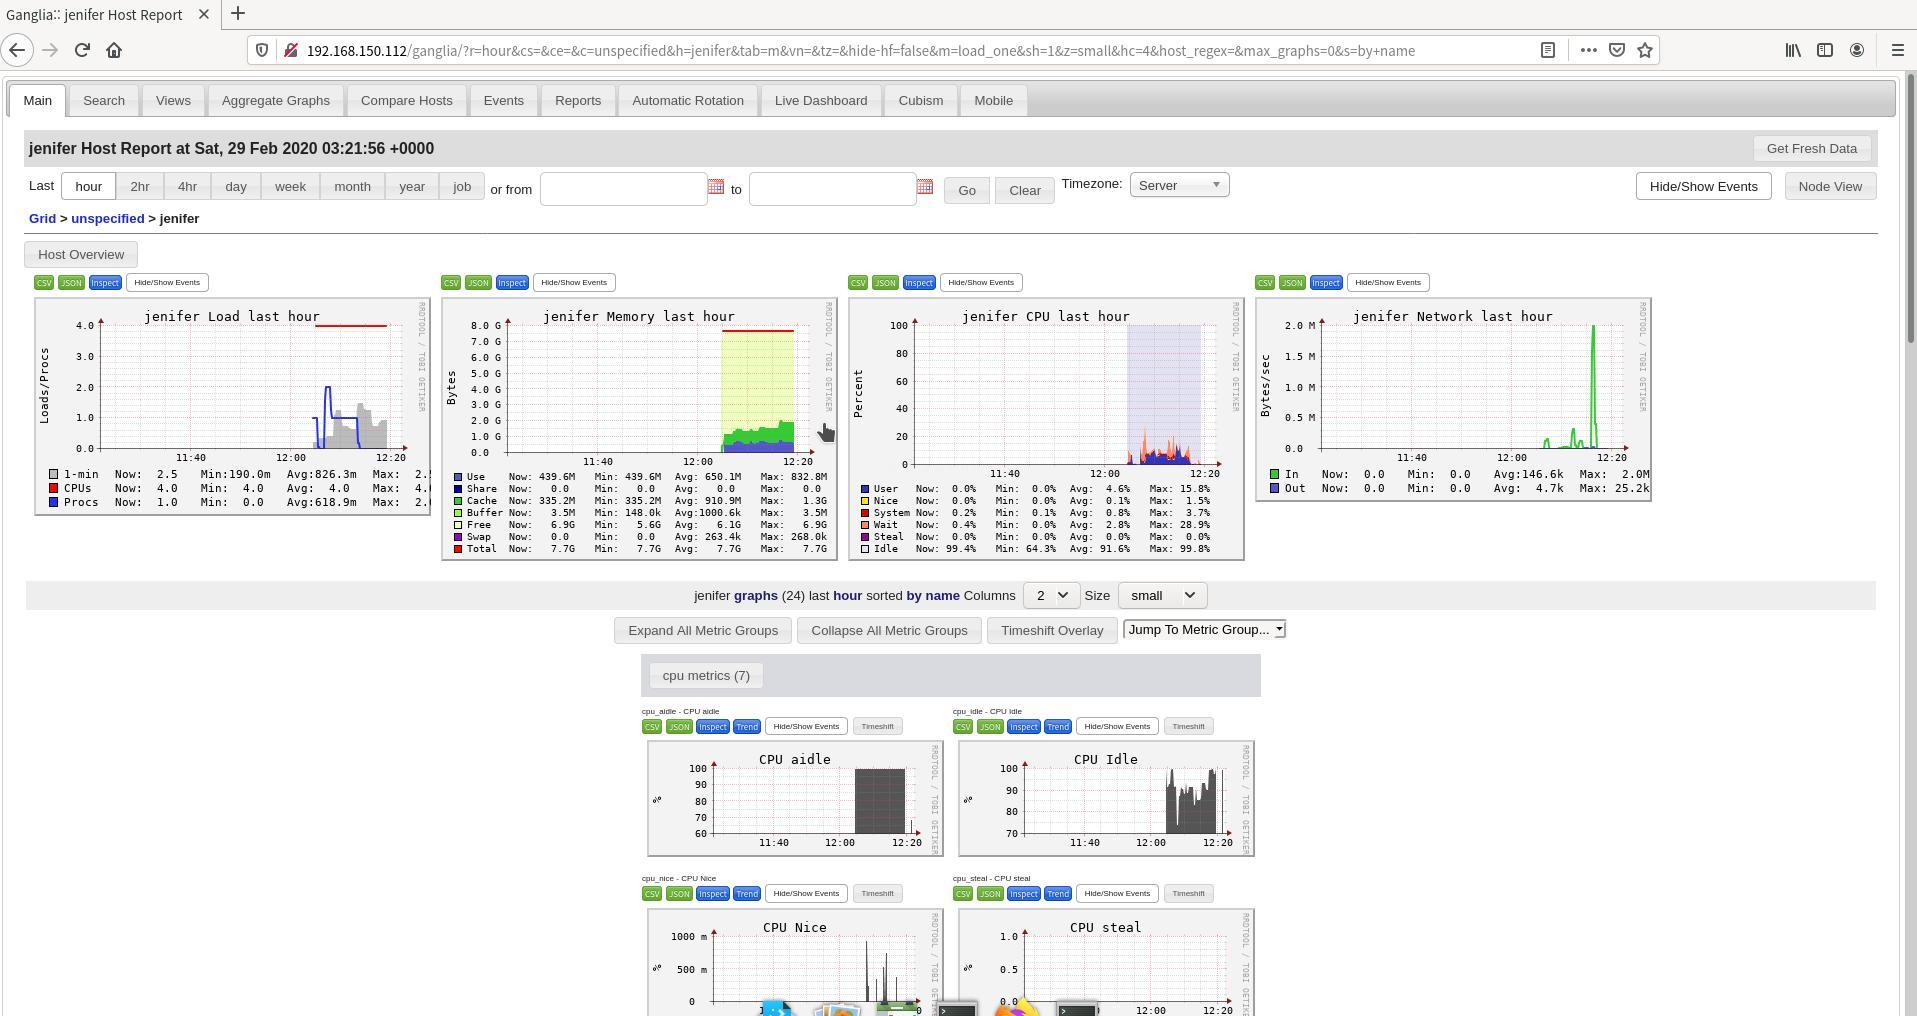 mb-file.php?path=2020%2F09%2F24%2FF130_20200629159336141591901_jpg.jpeg